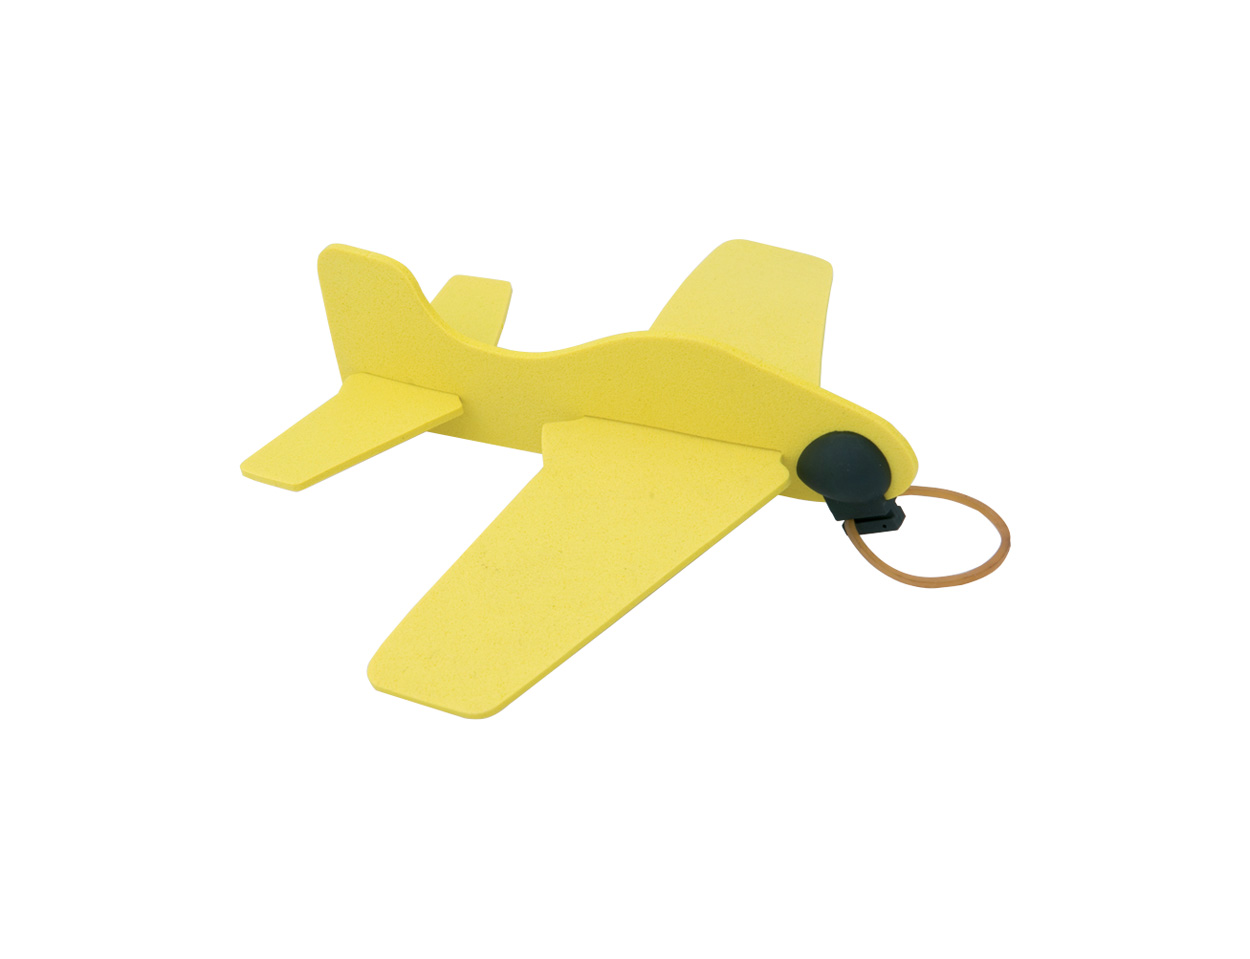 Baron airplane